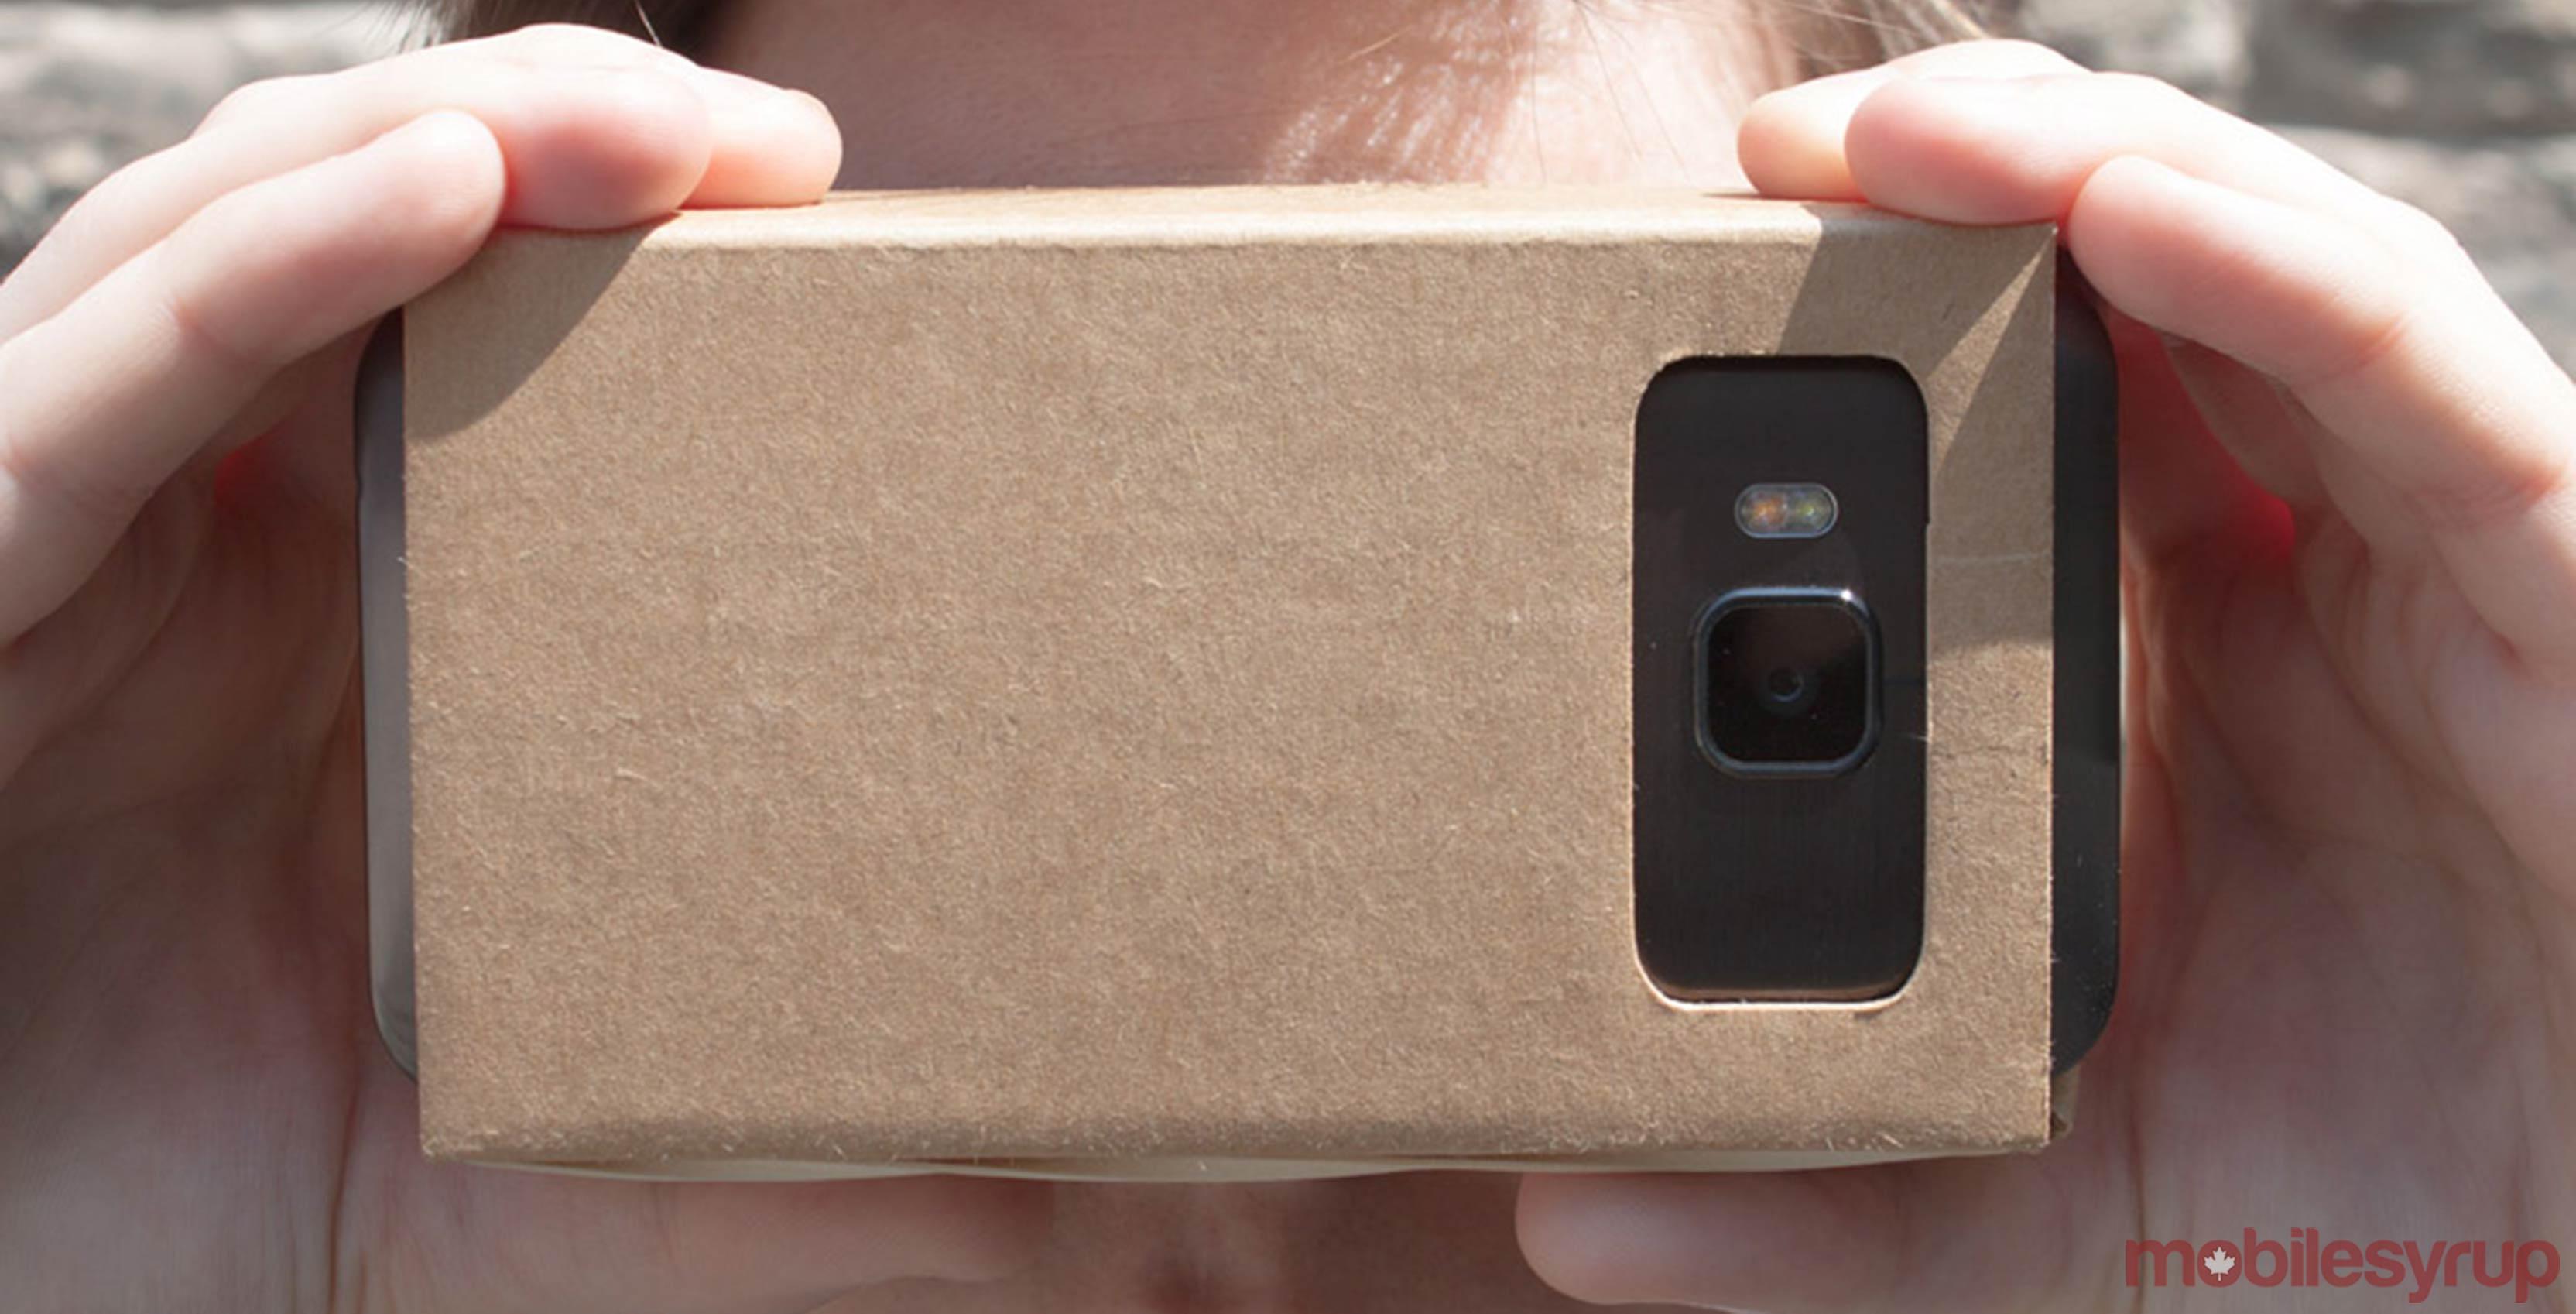 Google Cardboard with Google WebVR